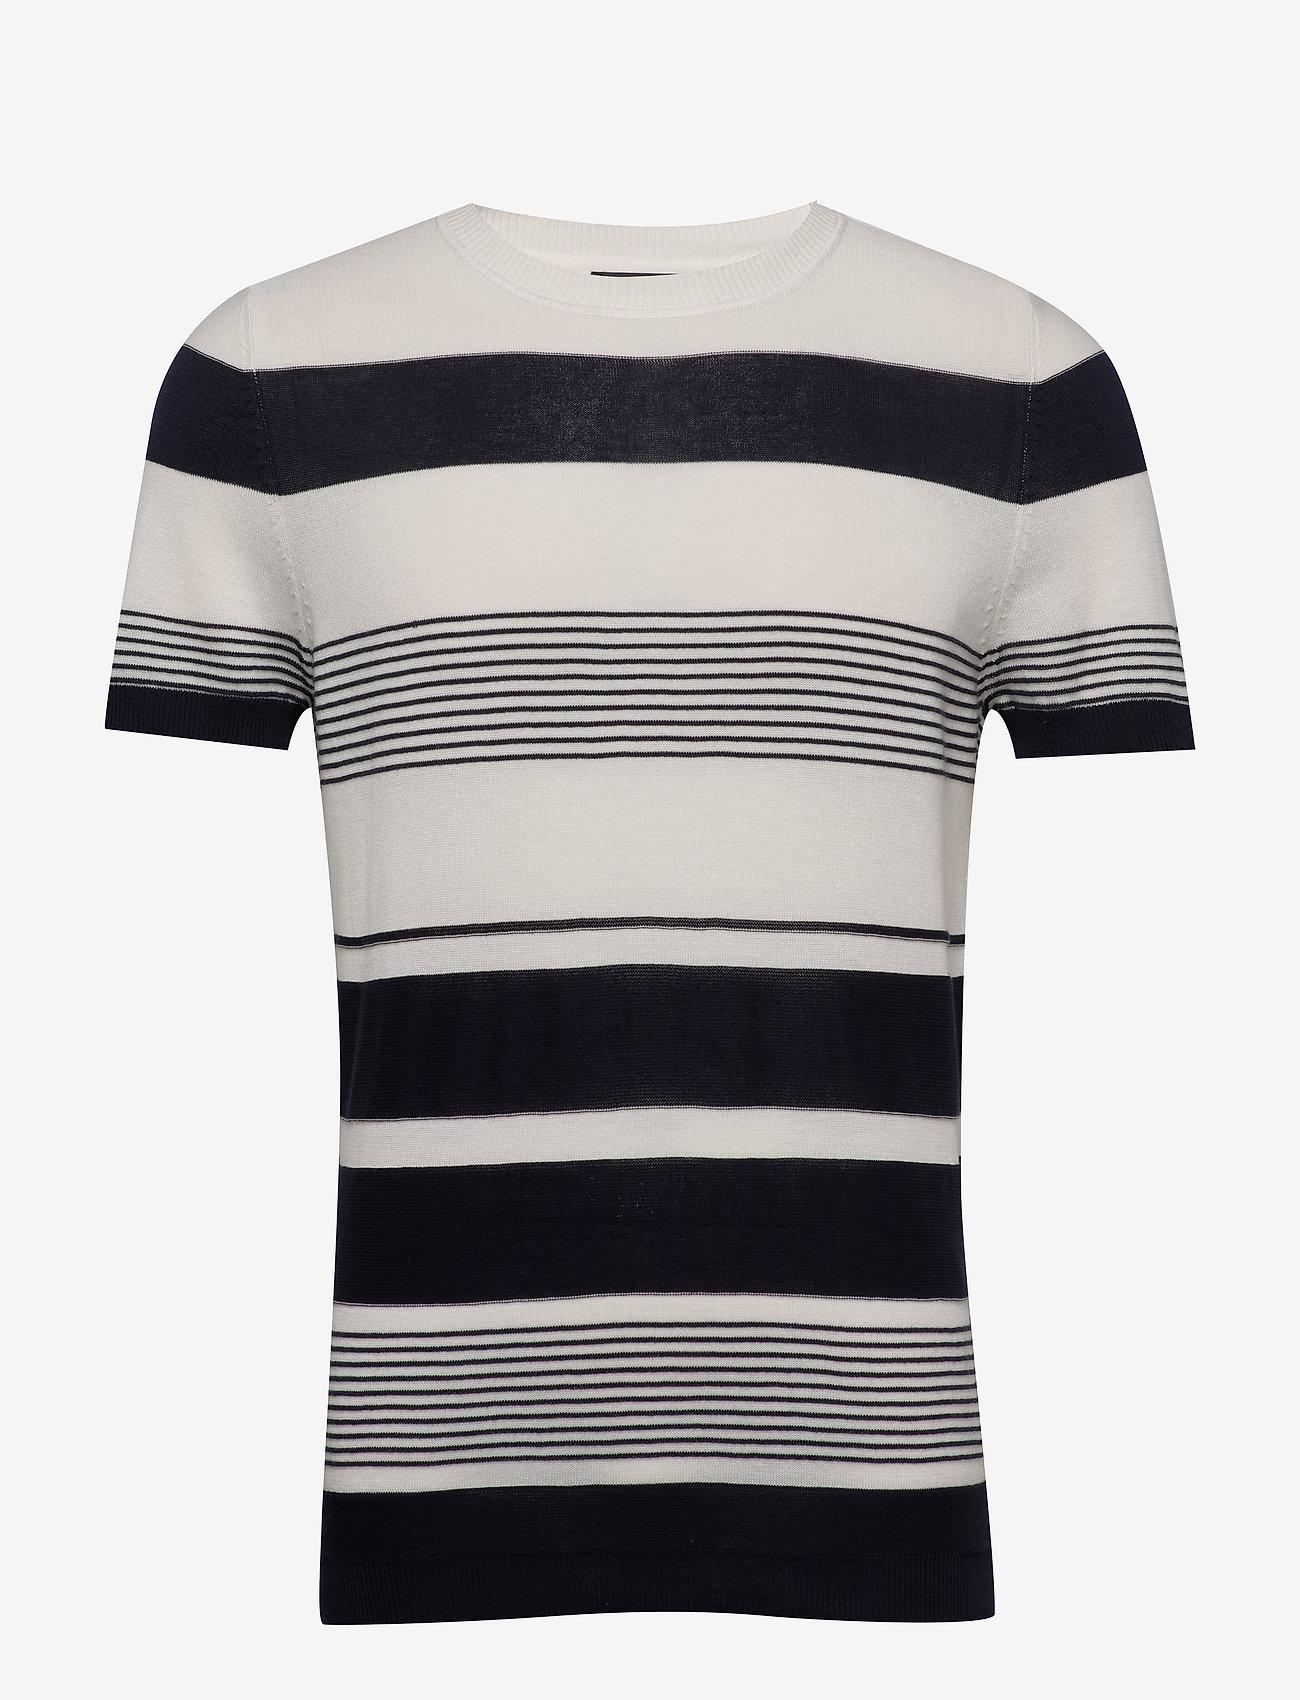 Jack & Jones - JPRBLALOST SS CREW NECK - kortärmade t-shirts - maritime blue - 0